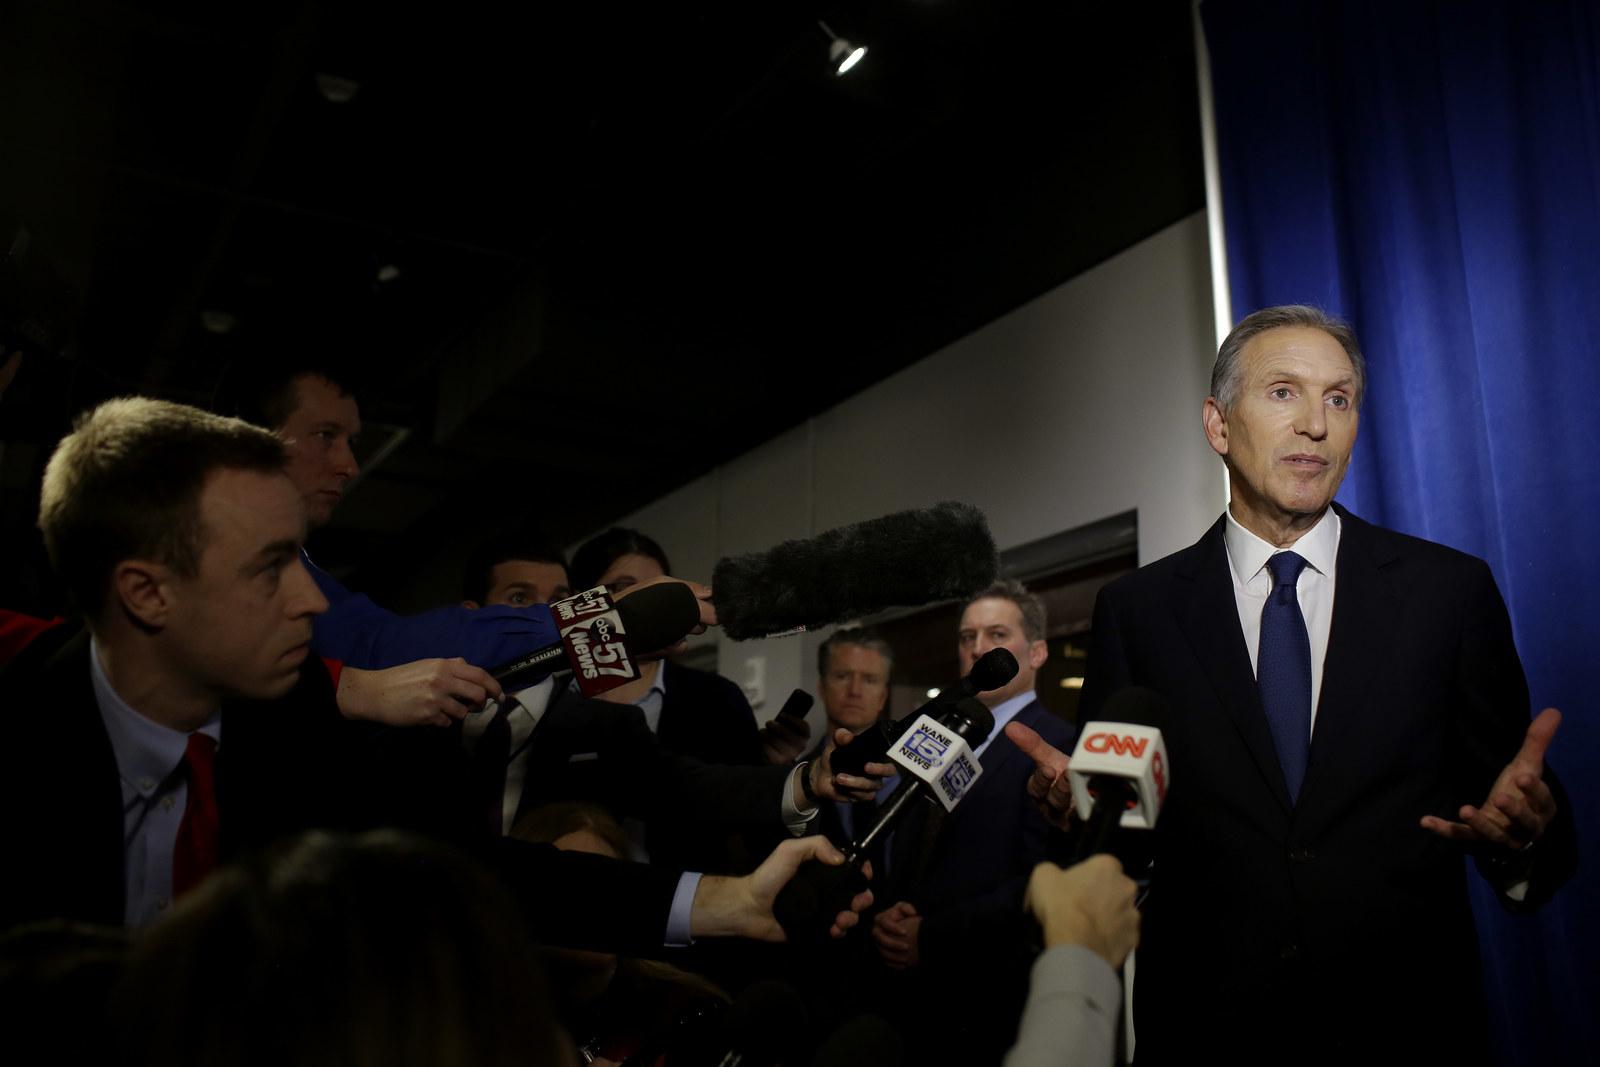 Opinion: Howard Schultz Wants A Billionaire's Veto Over The Primaries. Will Democrats Call His Bluff?